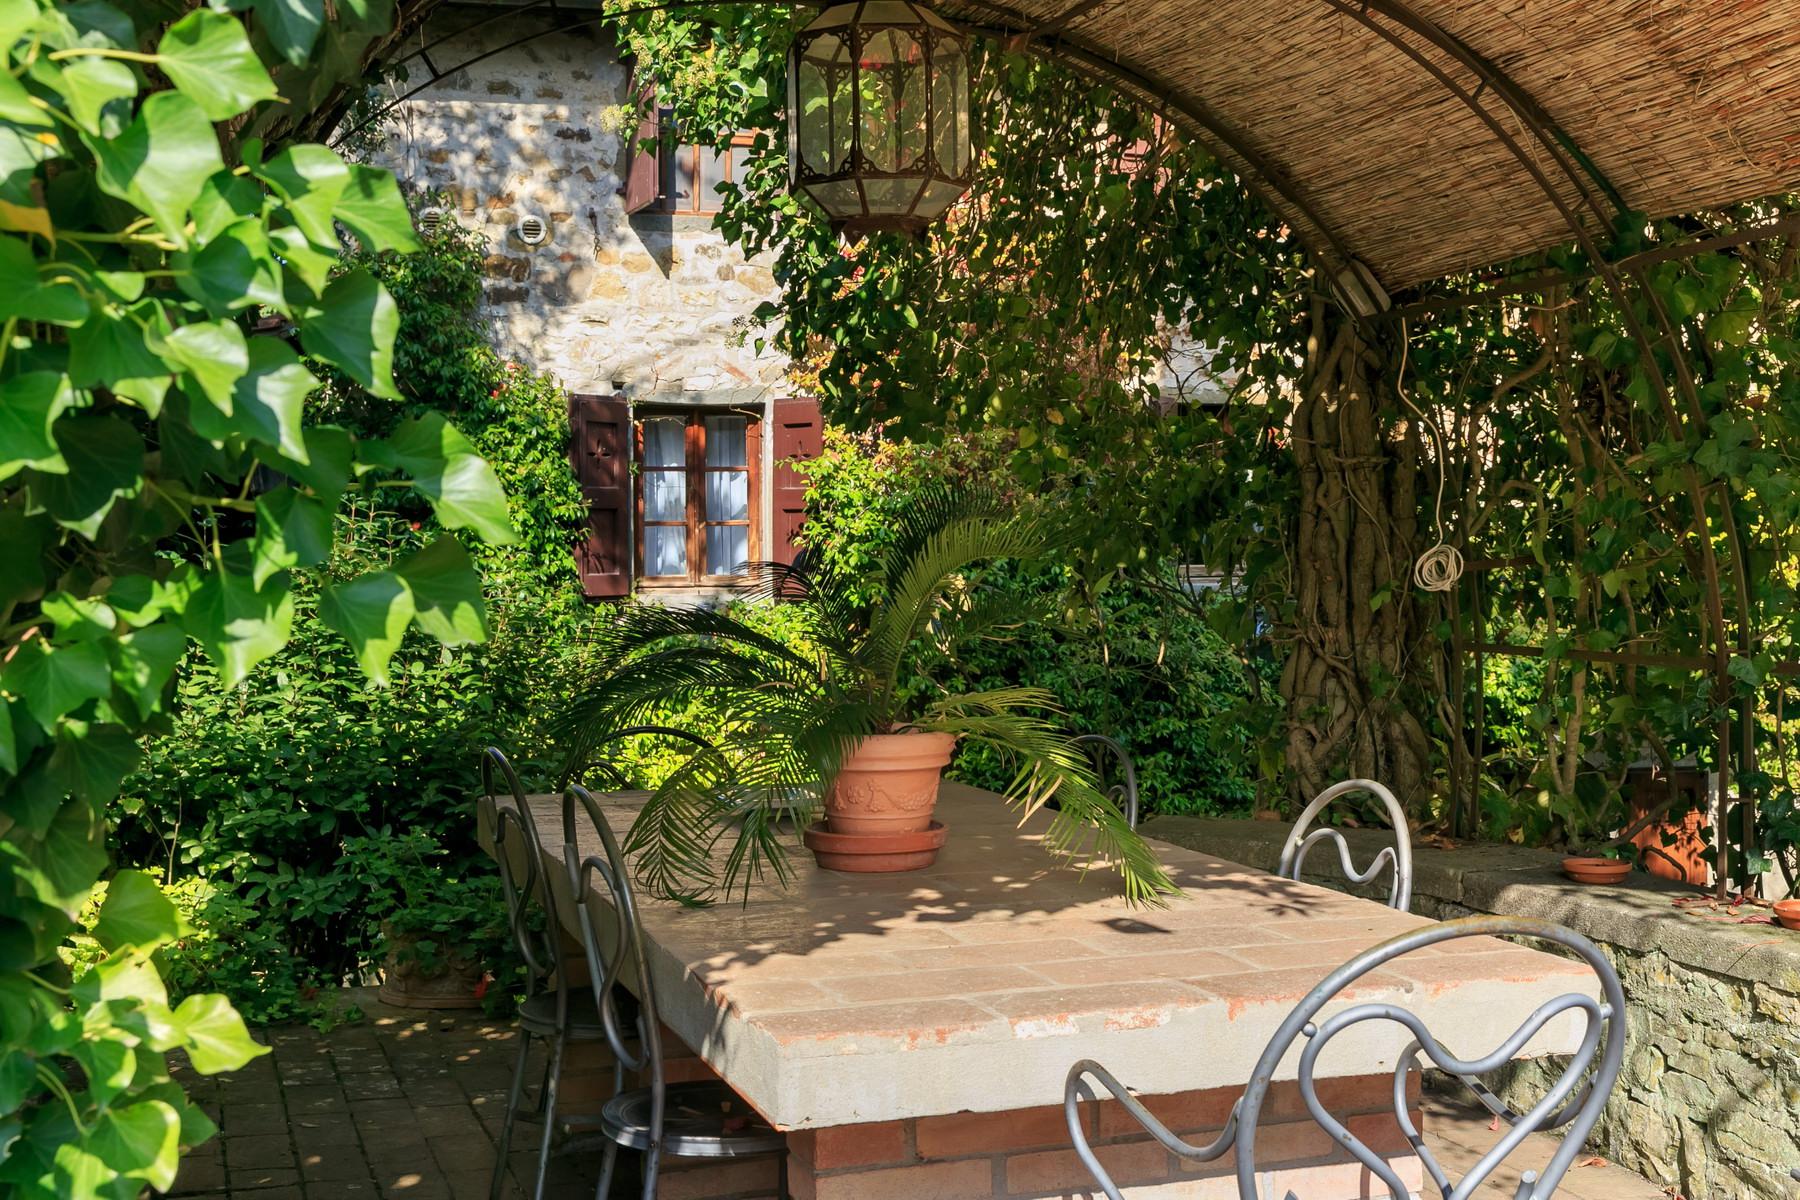 Rustico in Vendita a Castellina In Chianti: 5 locali, 720 mq - Foto 13